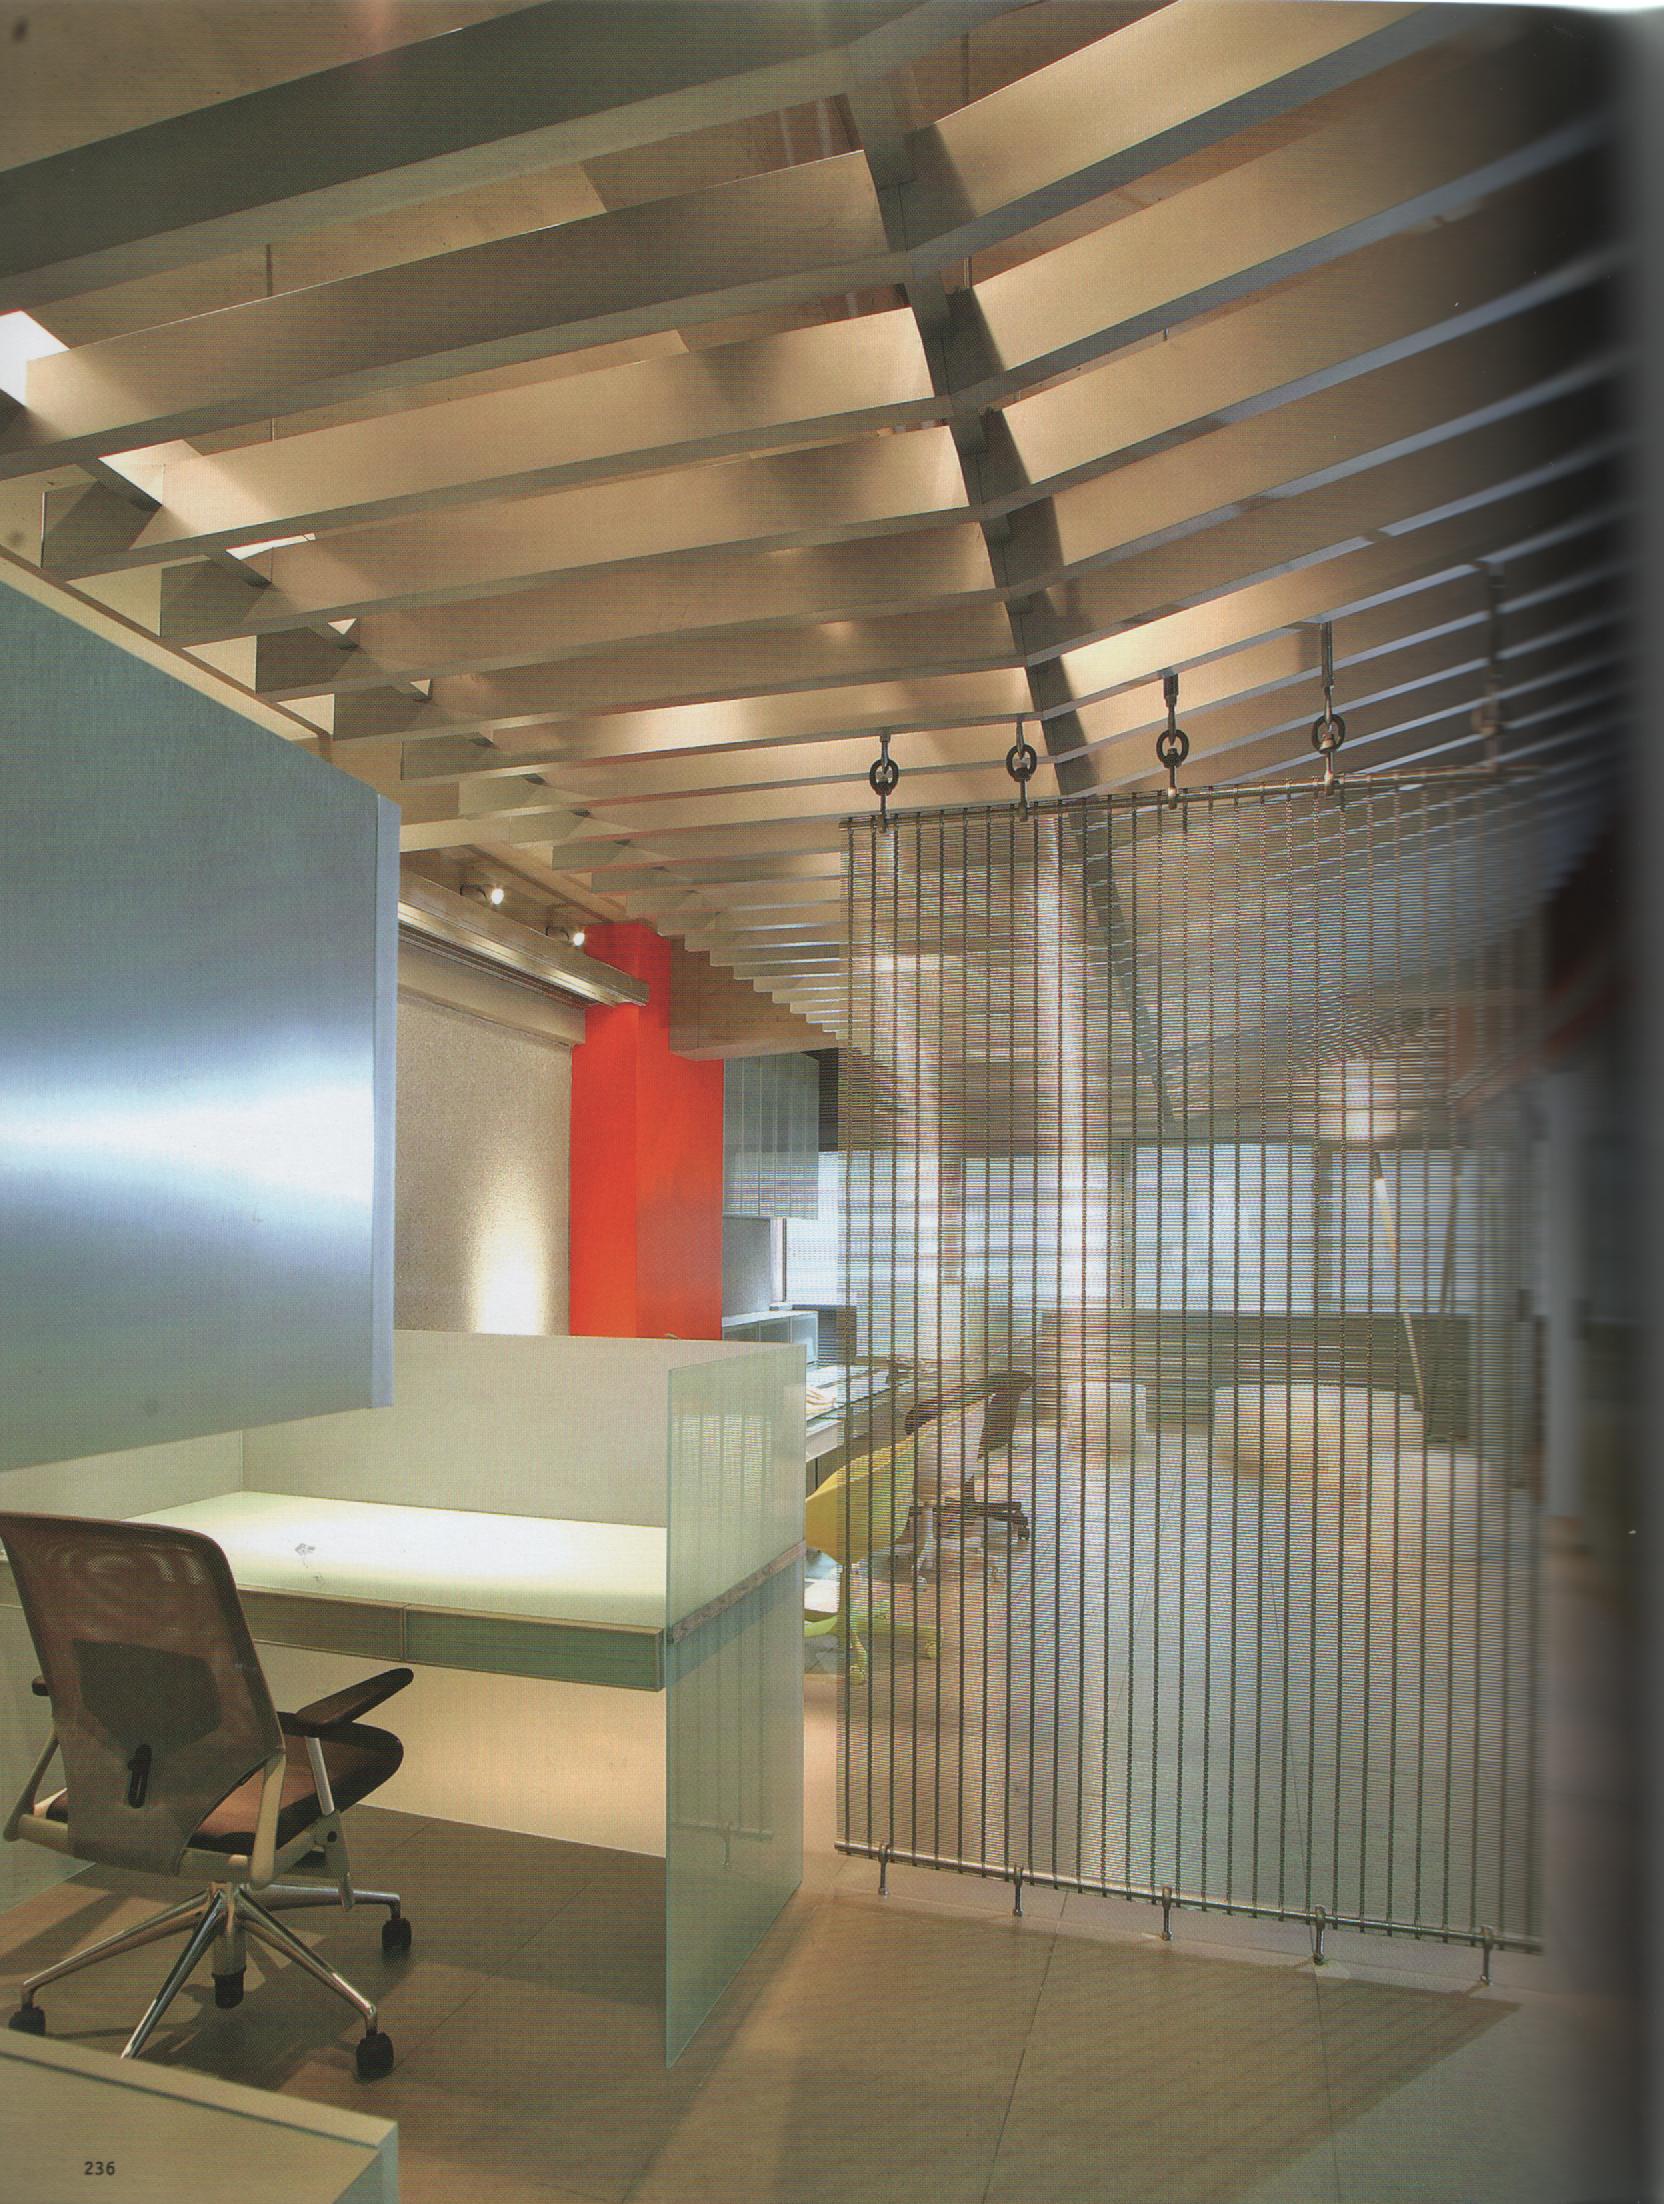 2009 Tercer Salón de Arquitectura Interior SAI   Selected project: Serviwall Office/Showrooom  DecoNews,